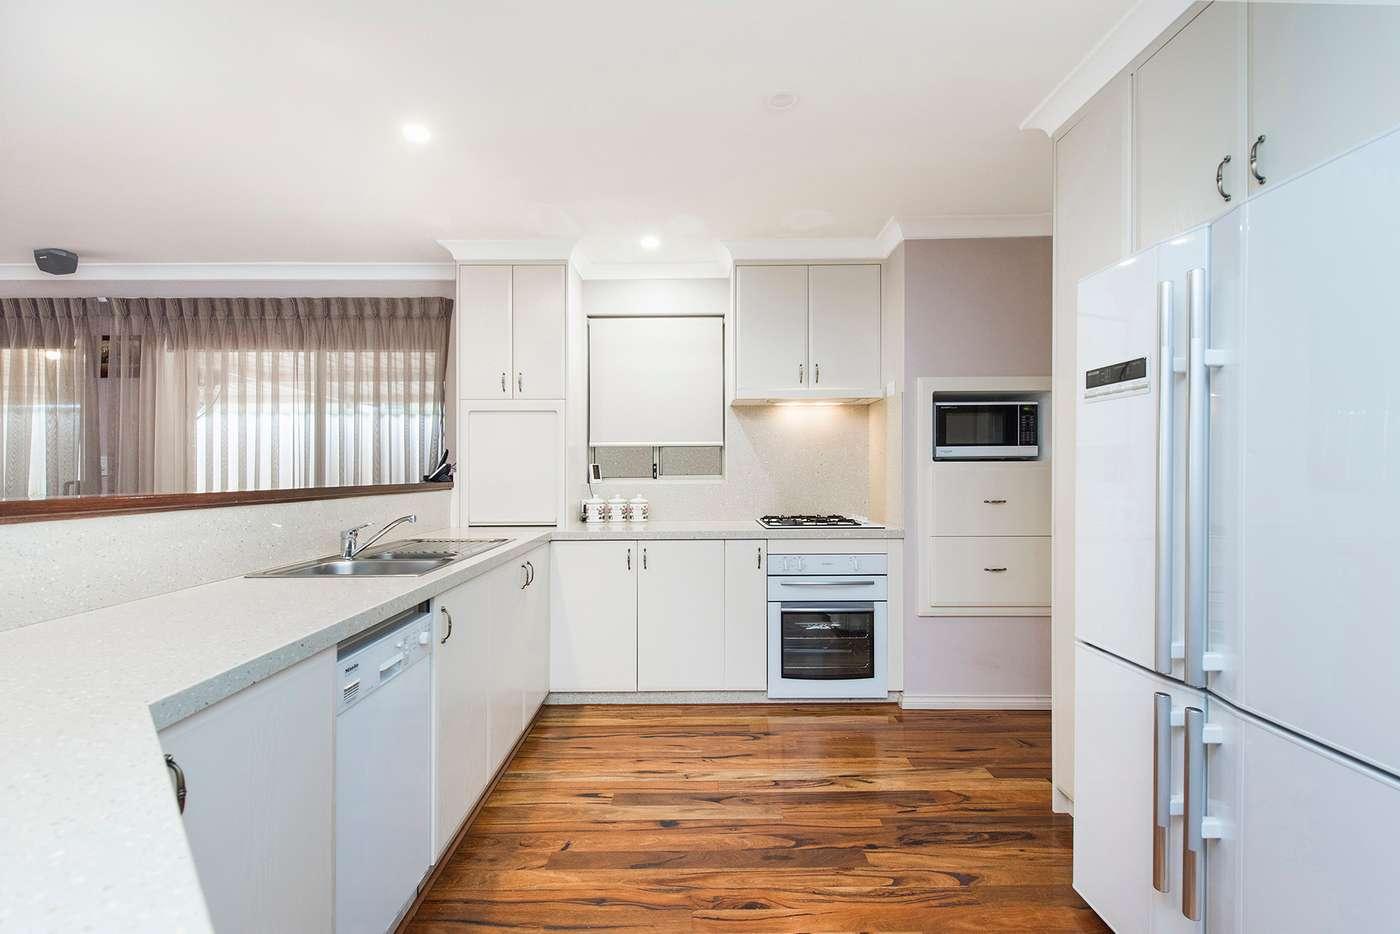 Sixth view of Homely house listing, 87 Bennett Street, Caversham WA 6055